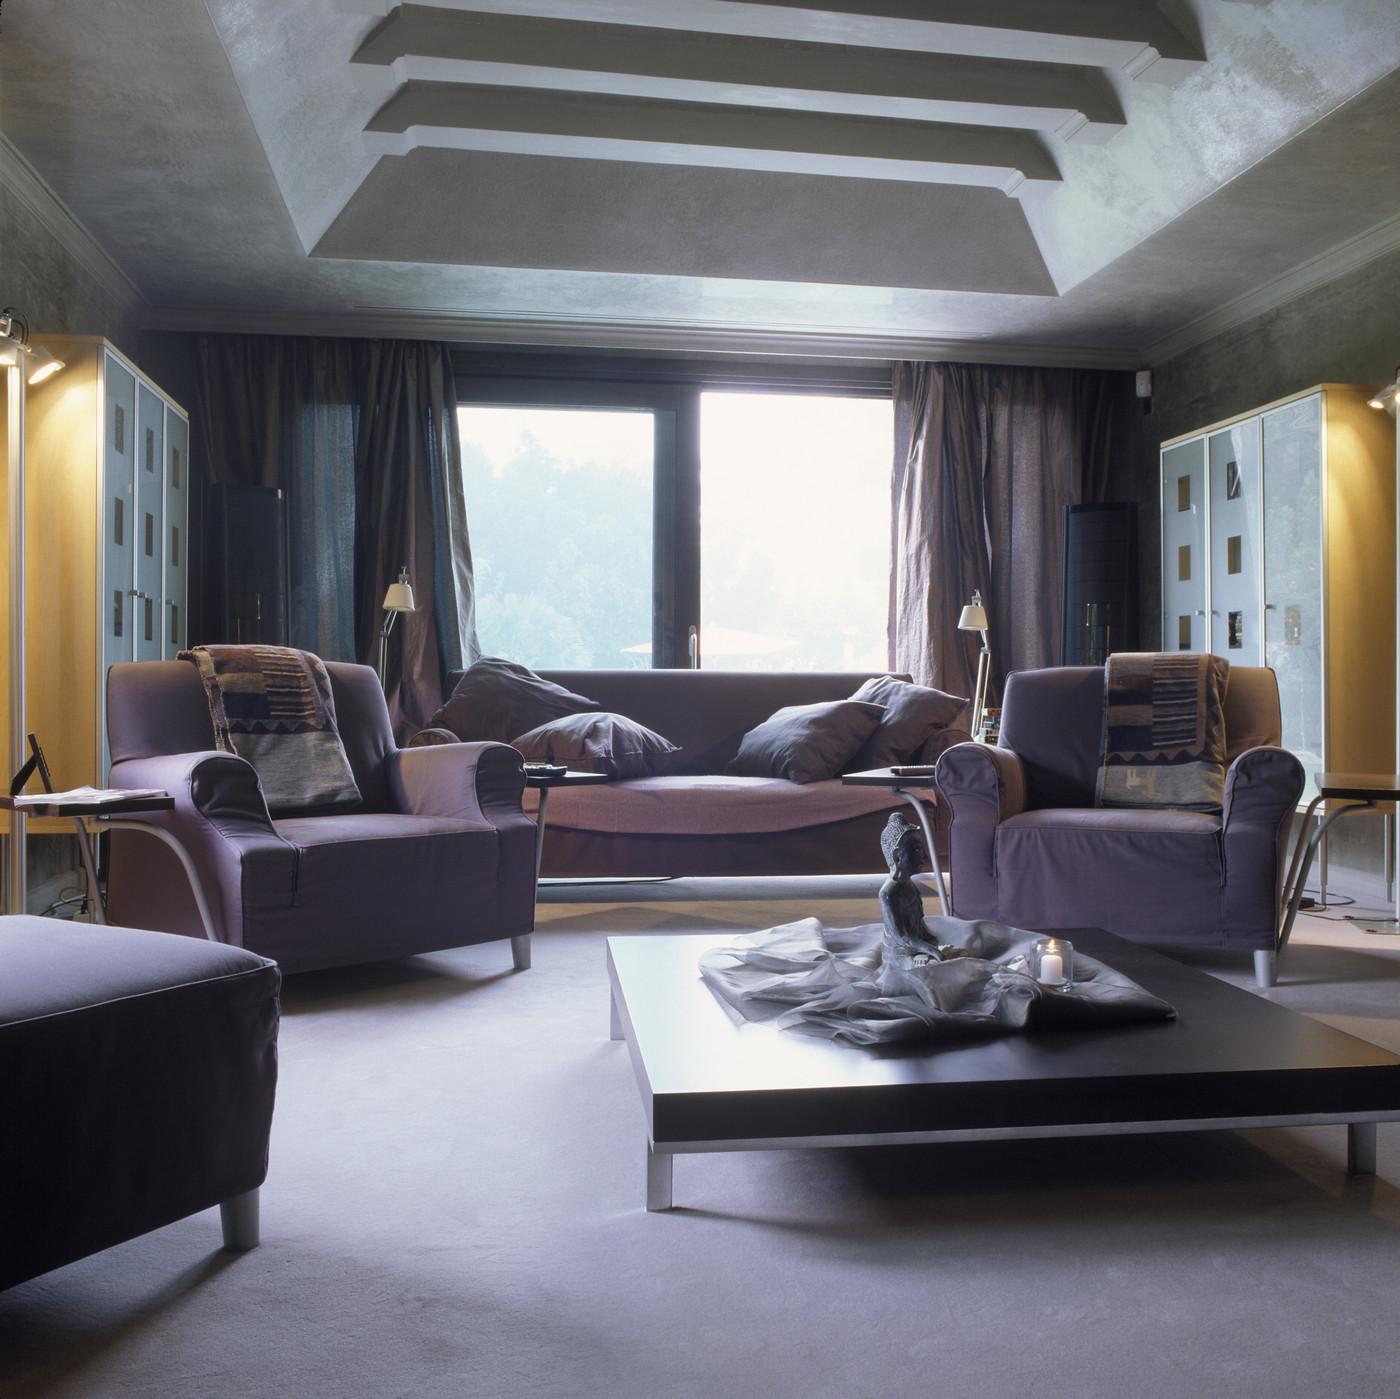 Living Room Designing ideas title=